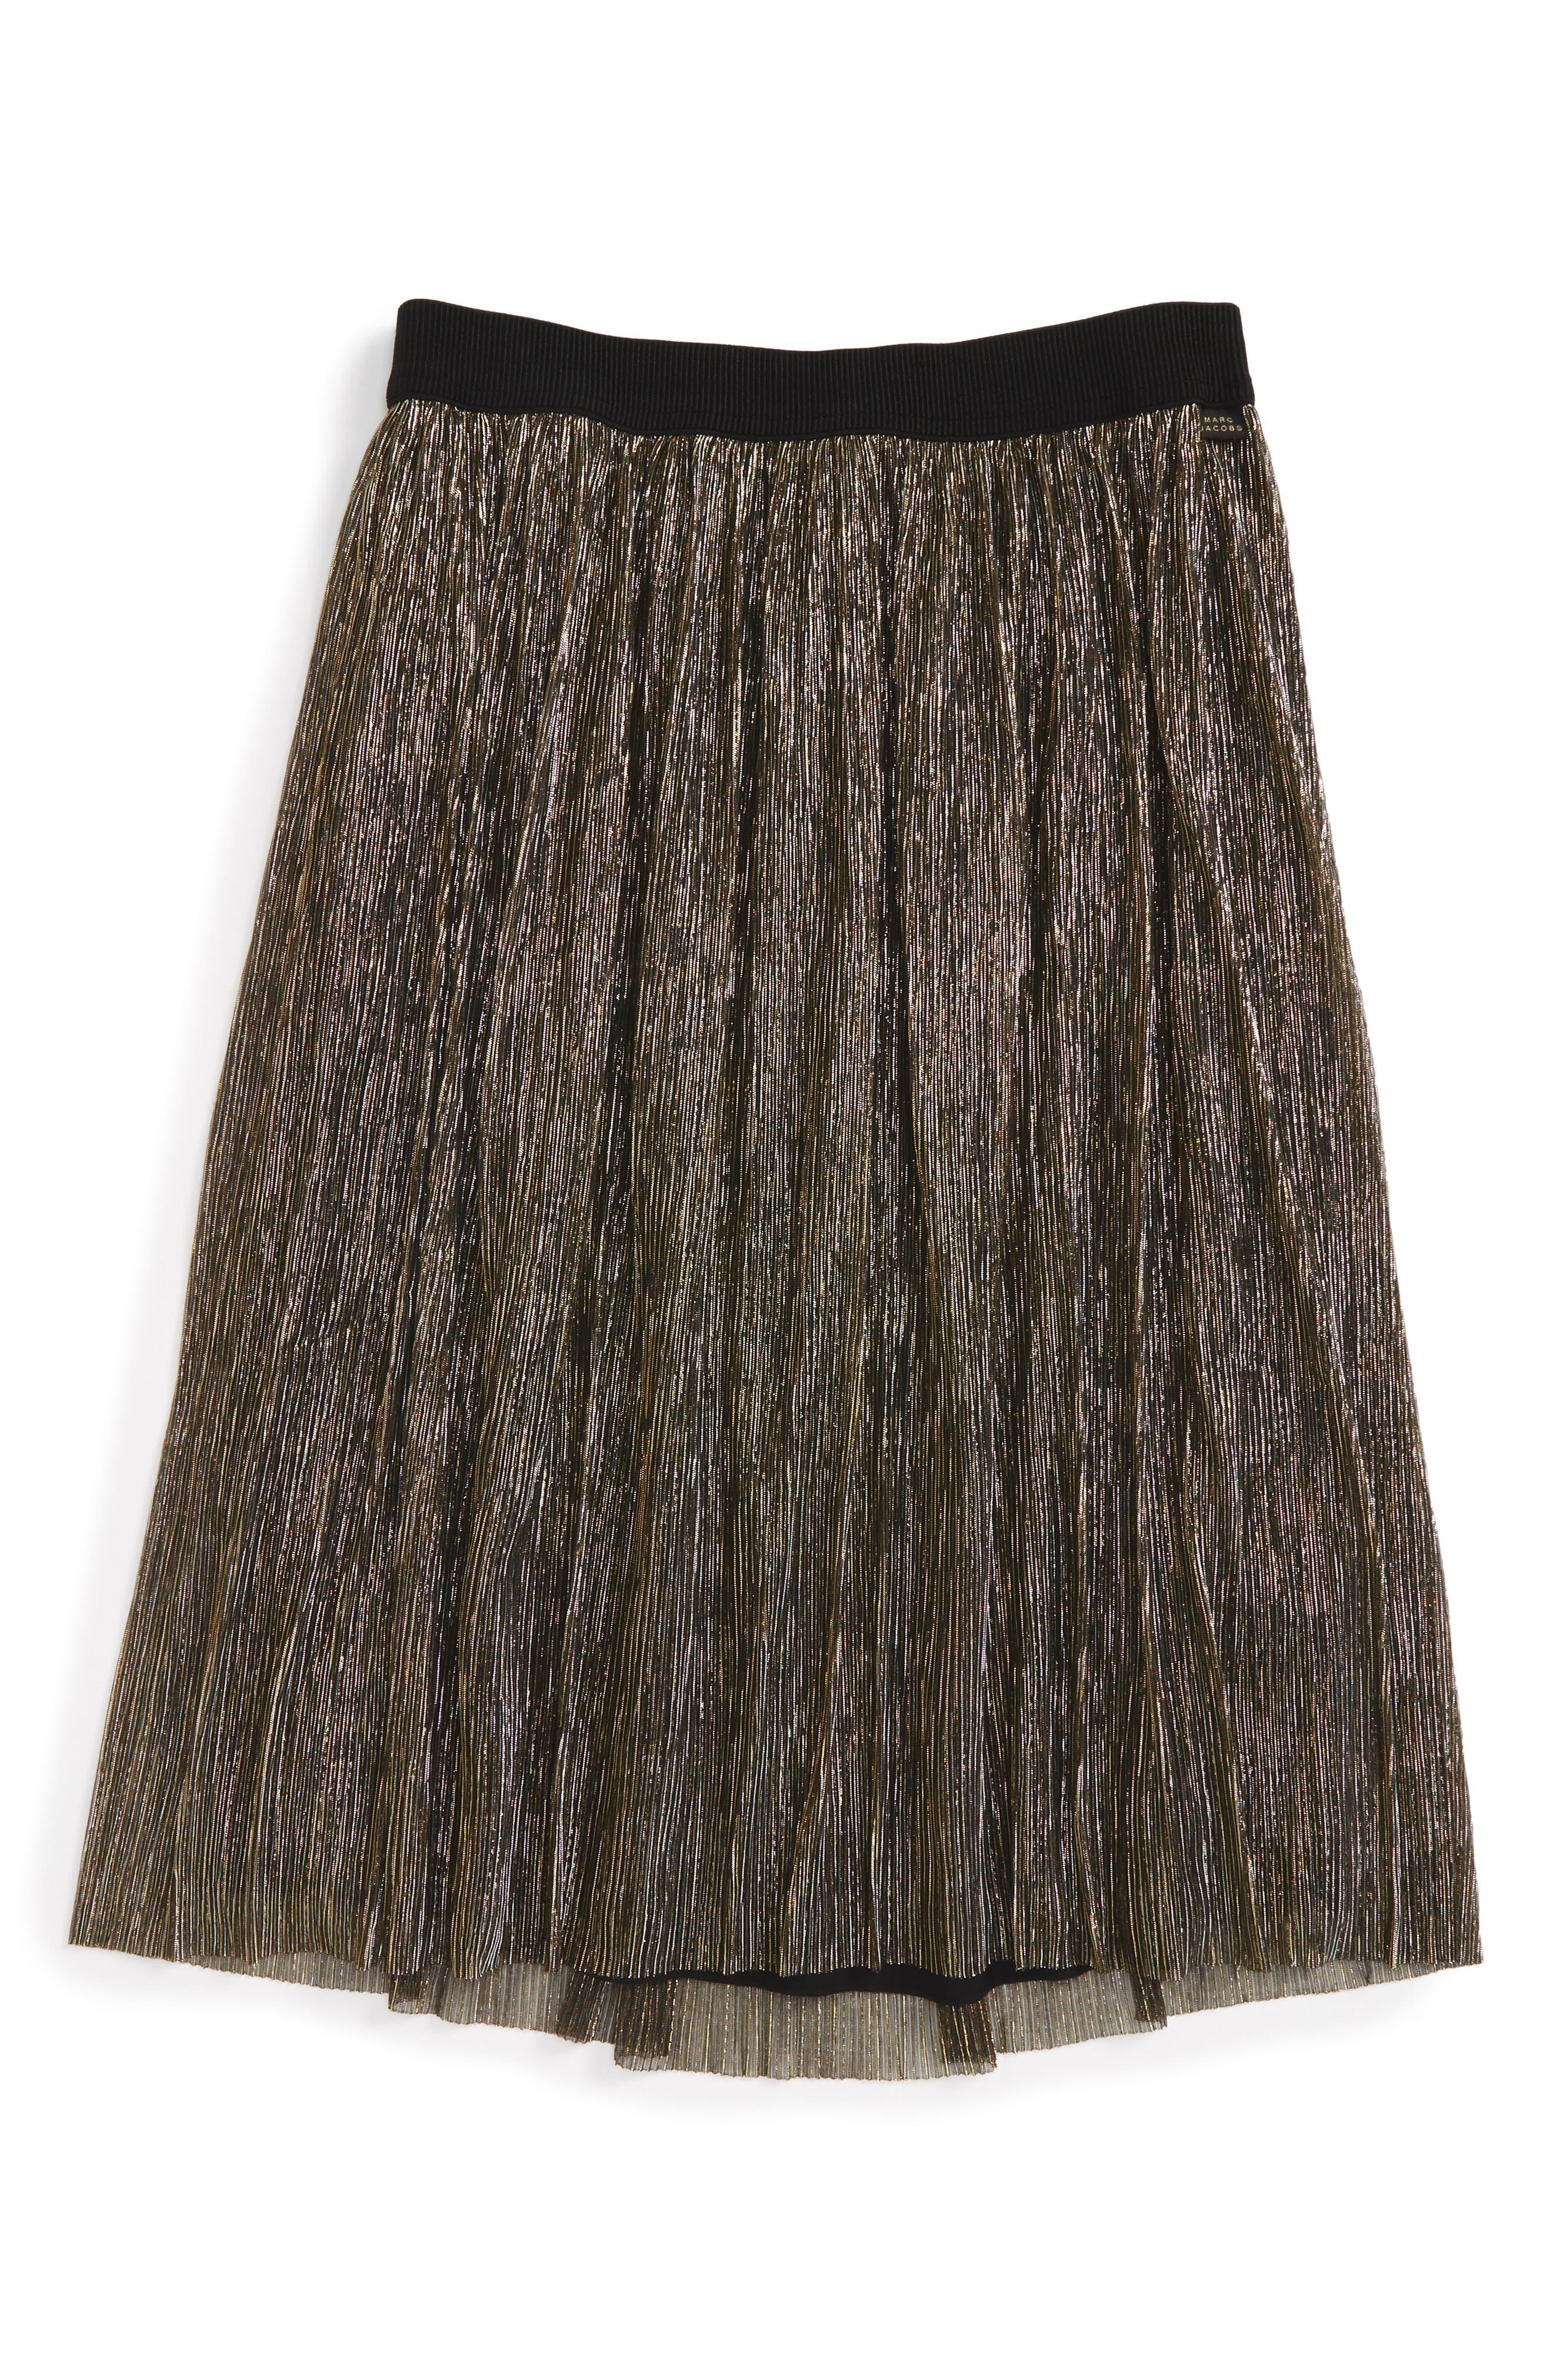 Pleated Metallic Skirt,                         Main,                         color, Black/ Gold